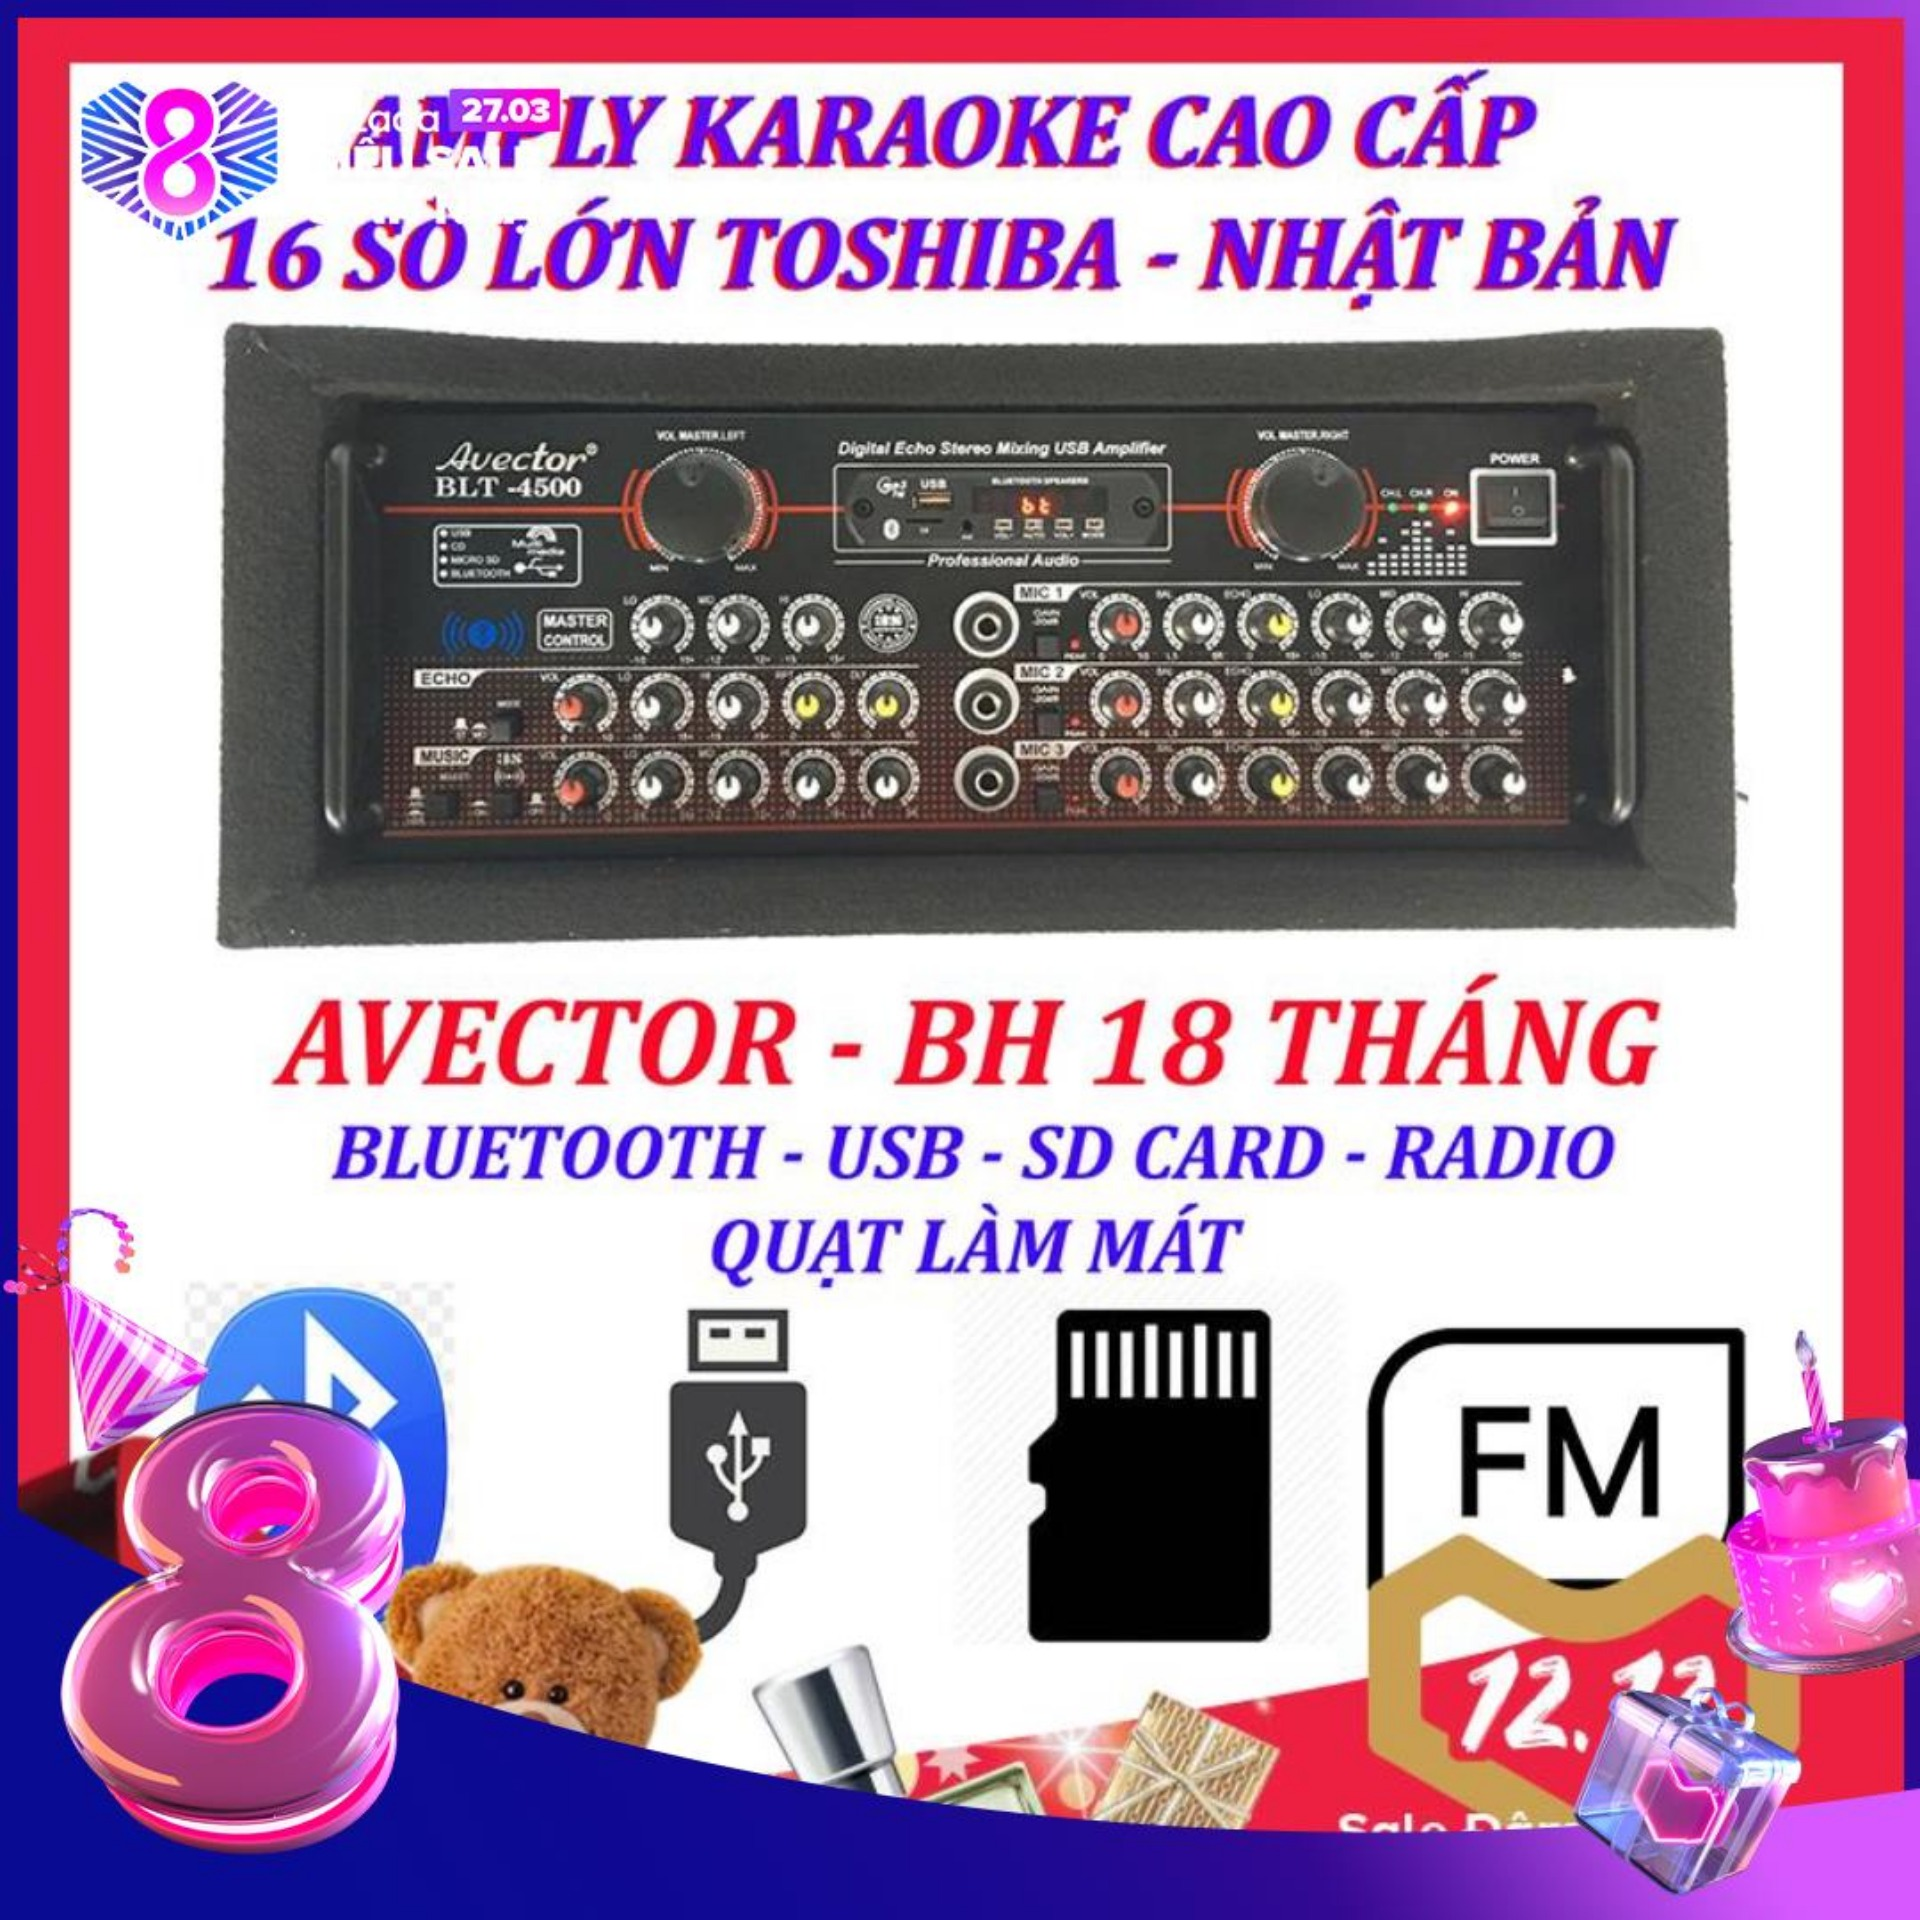 Amply karaoke ampli bluetooth amply nghe nhac amply karaoke hay cao cấp avector 4500